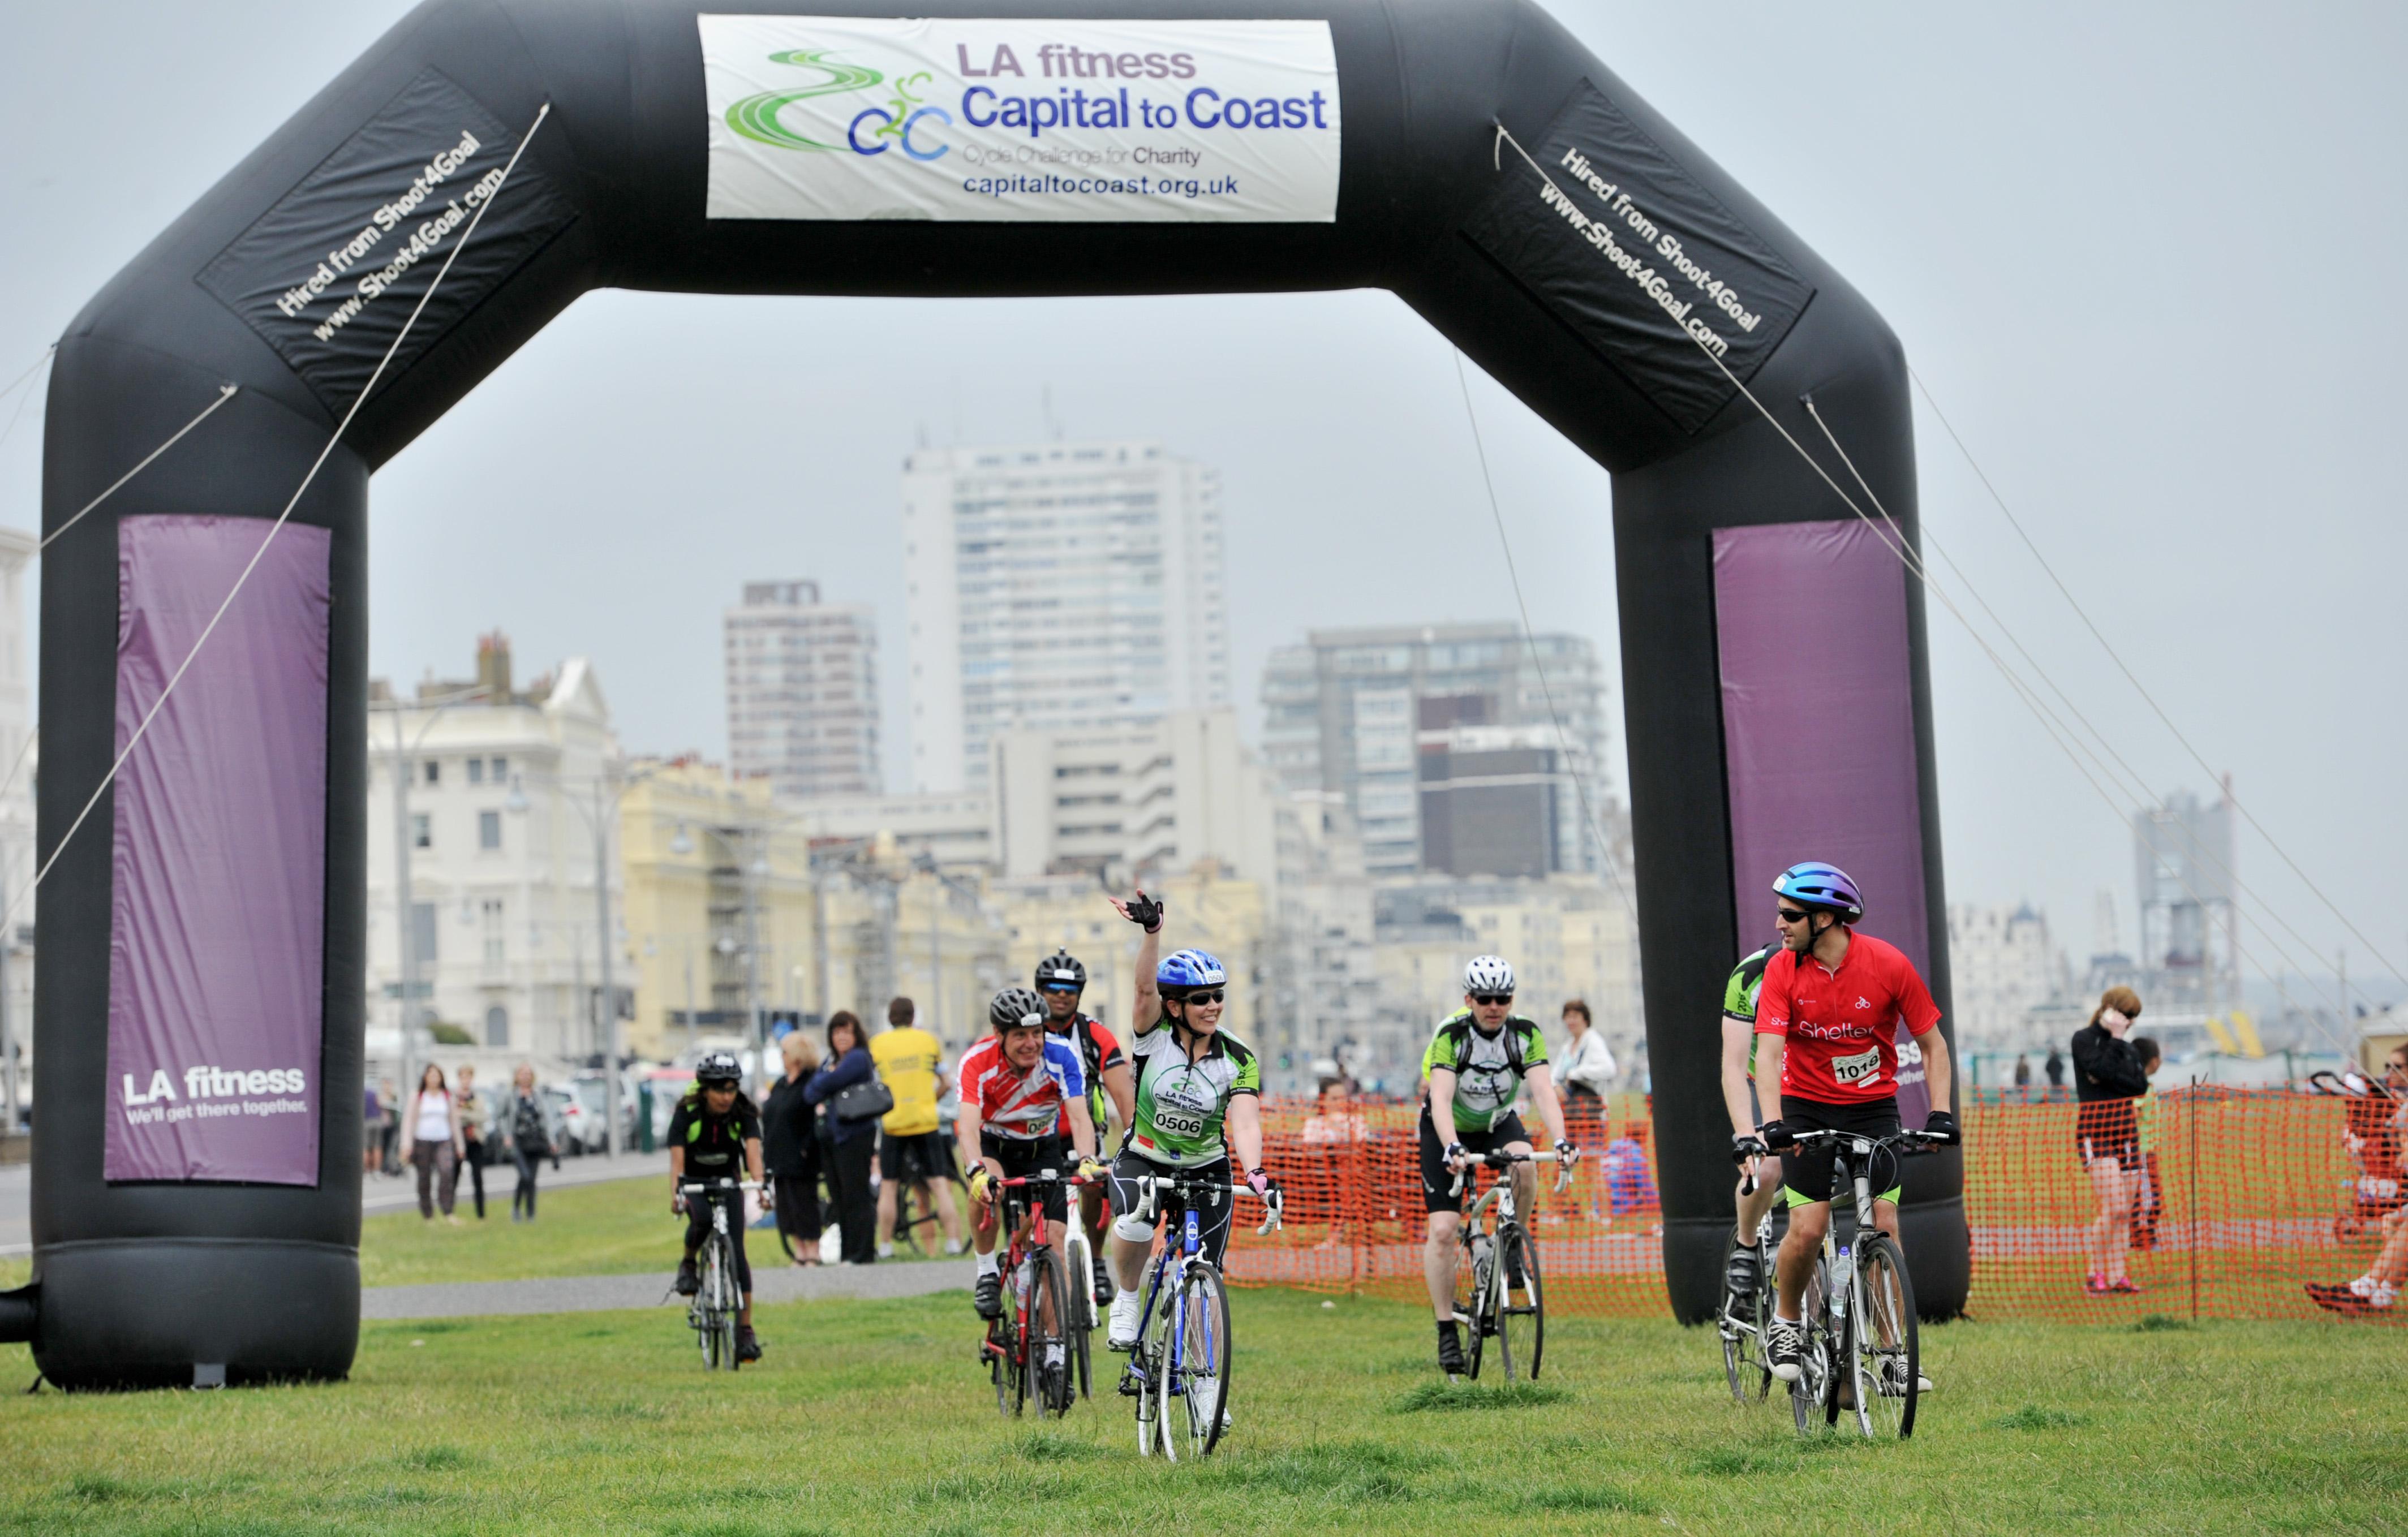 Capital to Coast Cycle Challenge